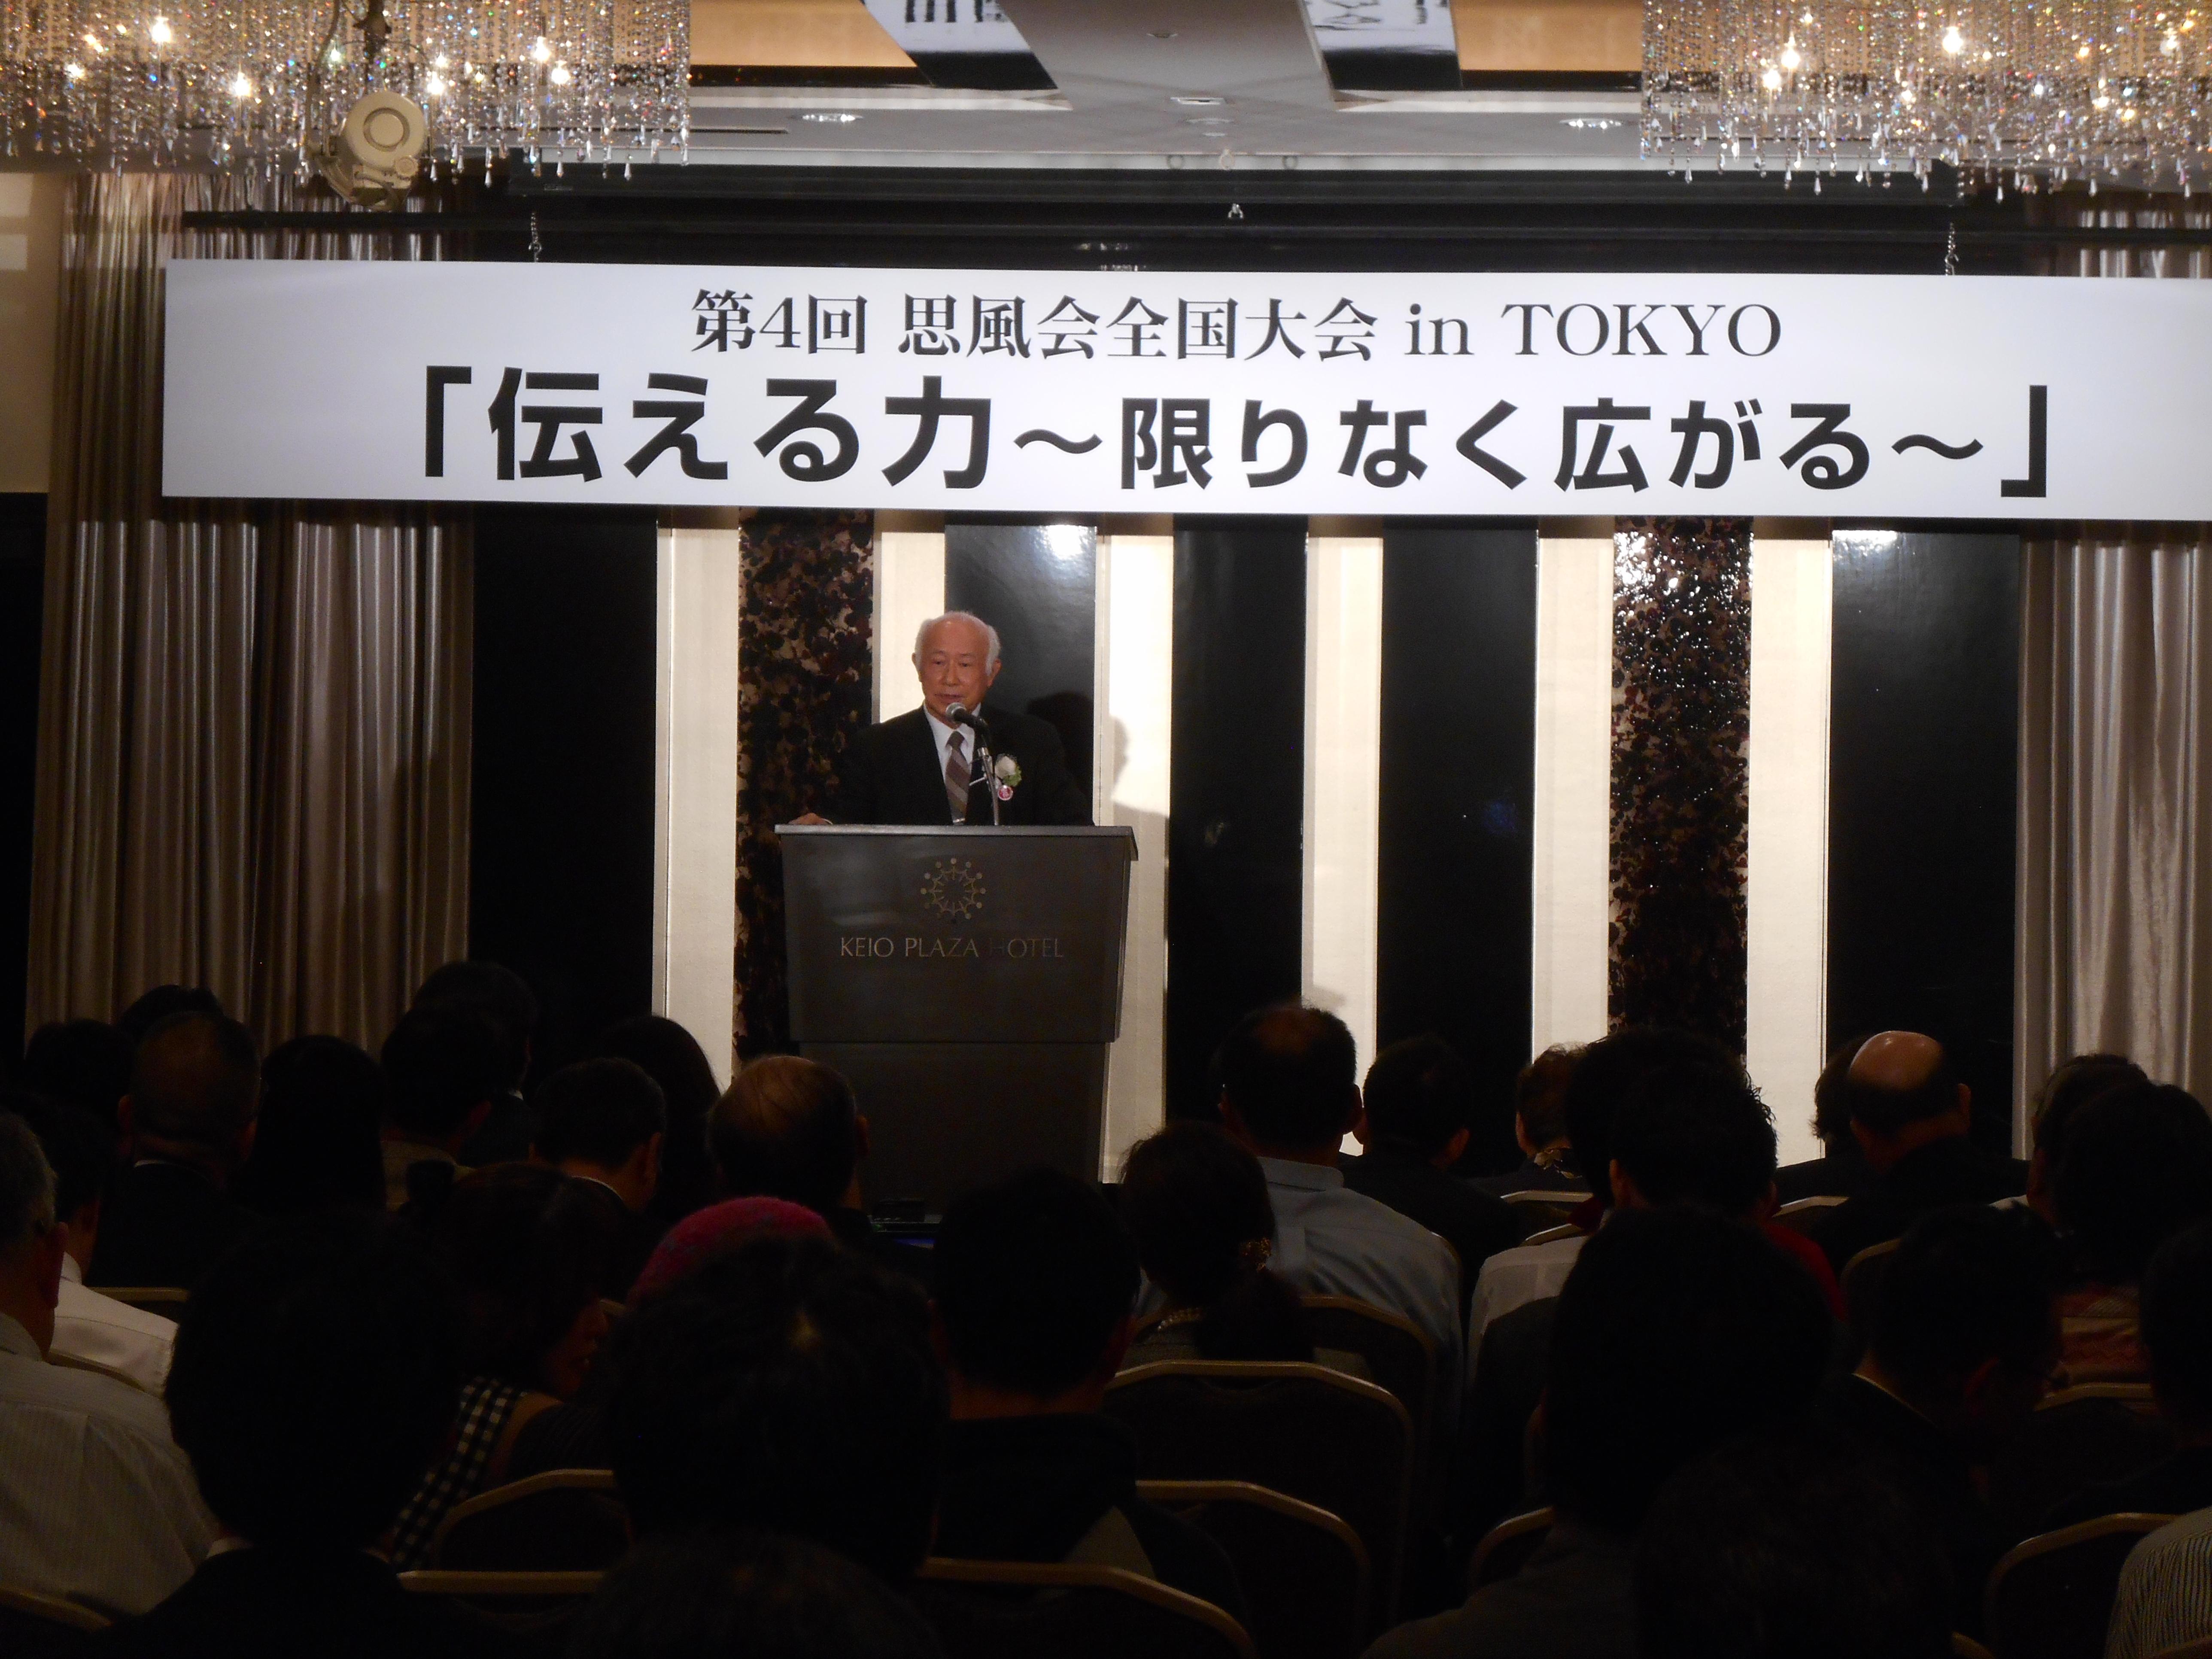 DSCN2097 - 平成30年度 東京思風塾 4月7日(土)「時代が問題をつくり、問題が人物をつくる」